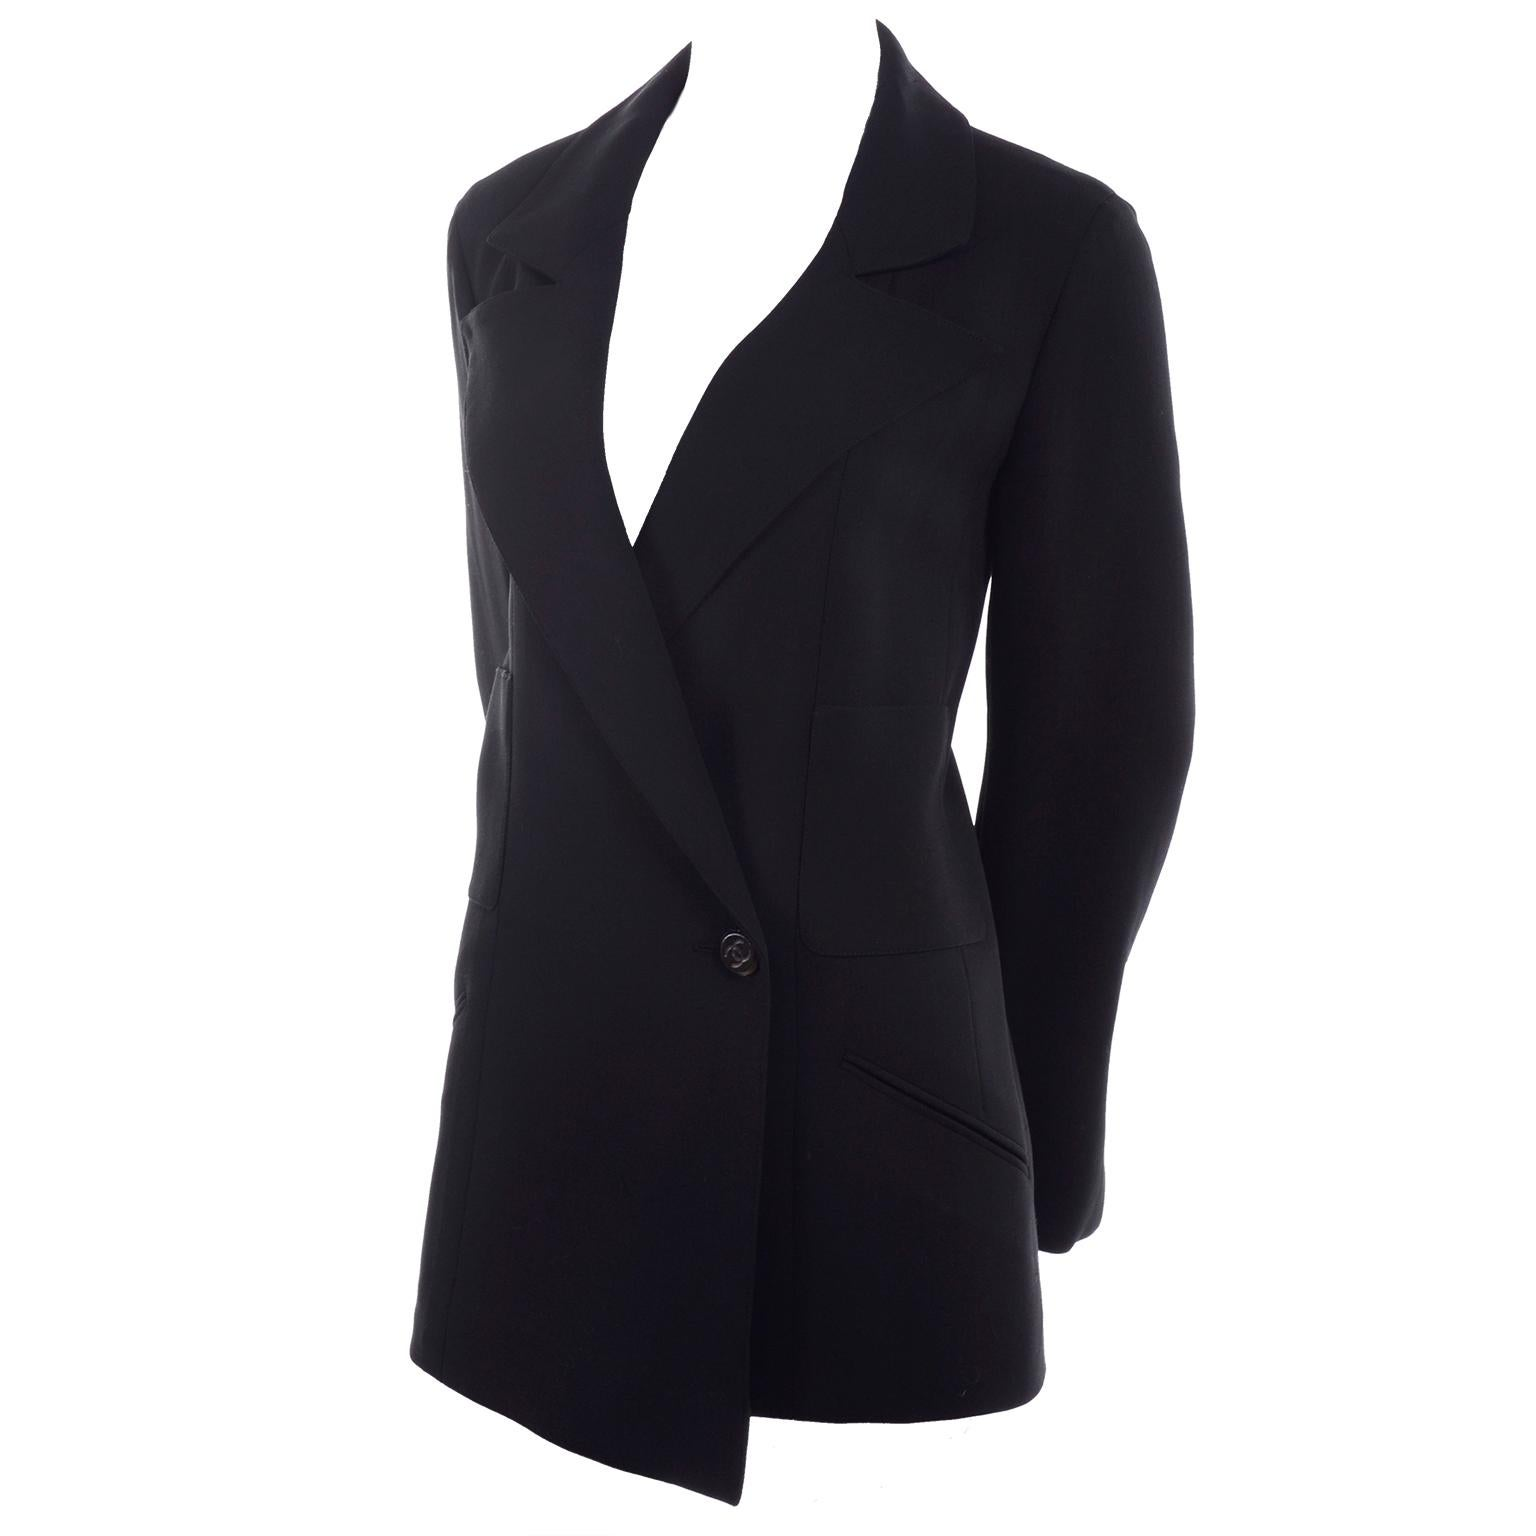 1998 Chanel Blazer in Black Wool With Asymmetrical Hemline Size 40